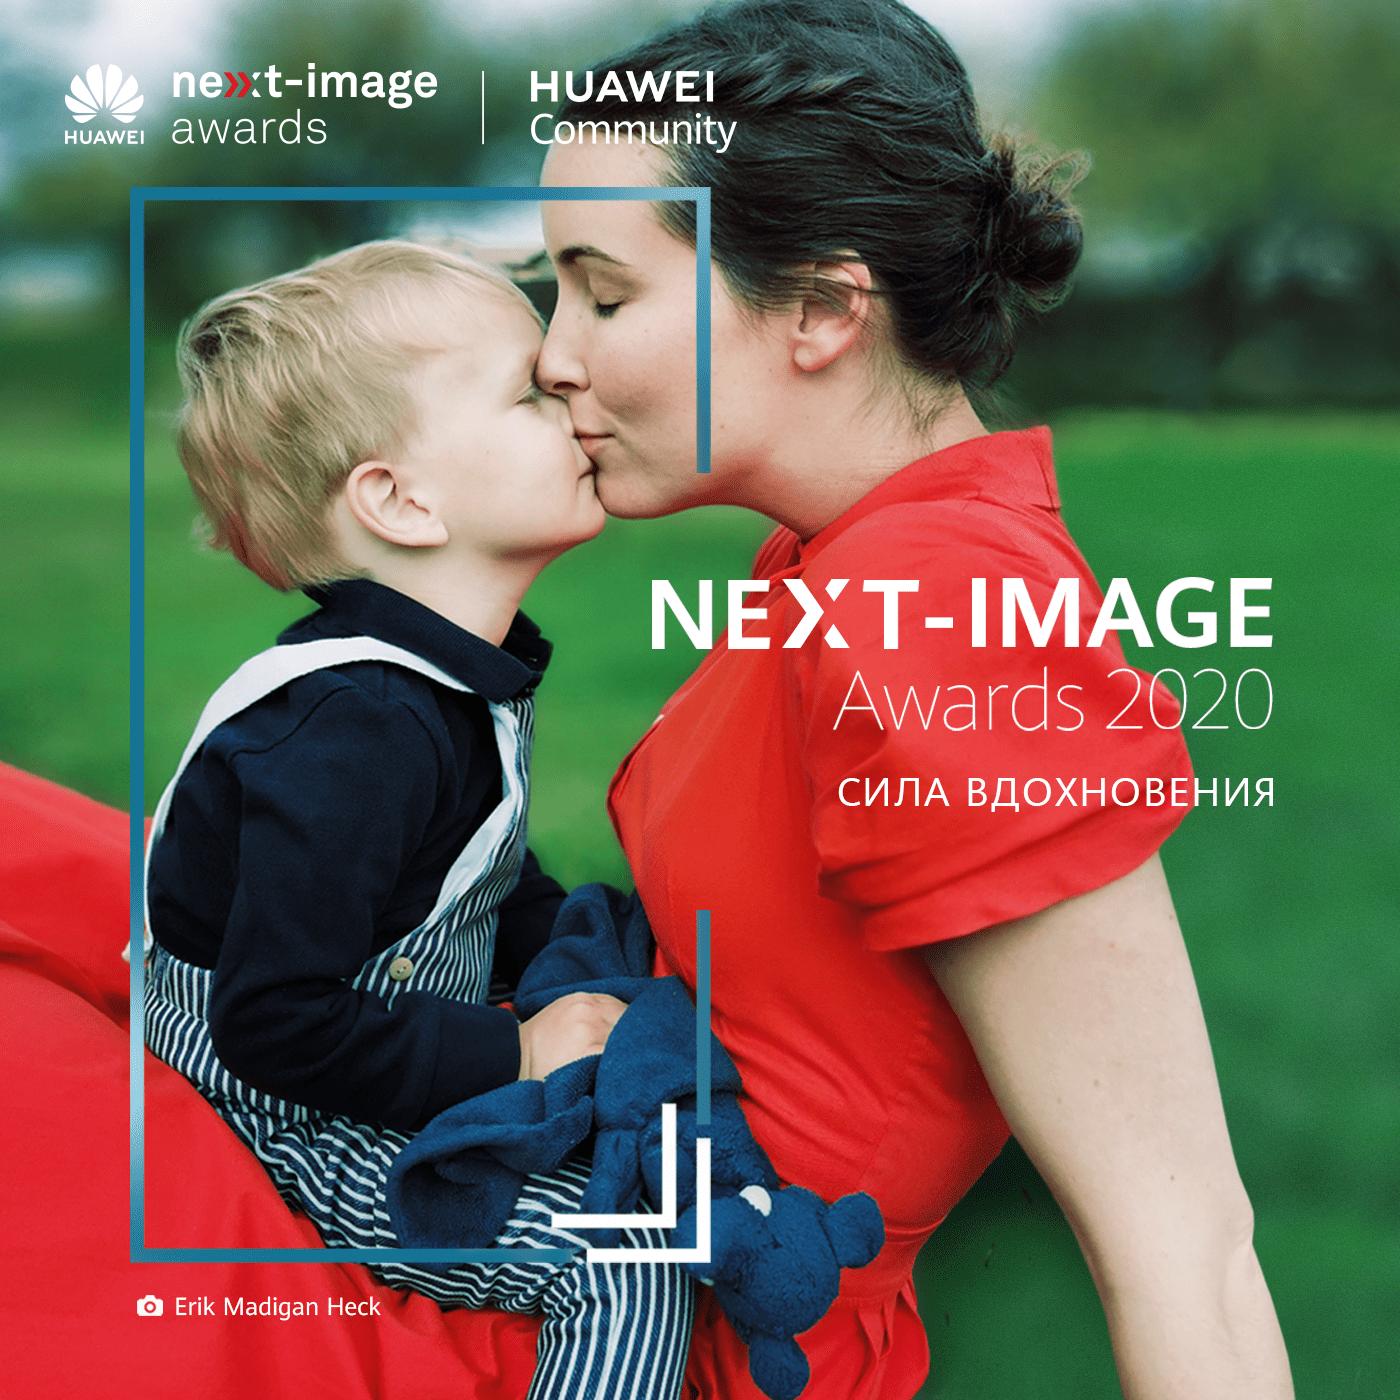 Huawei запустил фотоконкурс NEXT-IMAGE 2020 (next image)